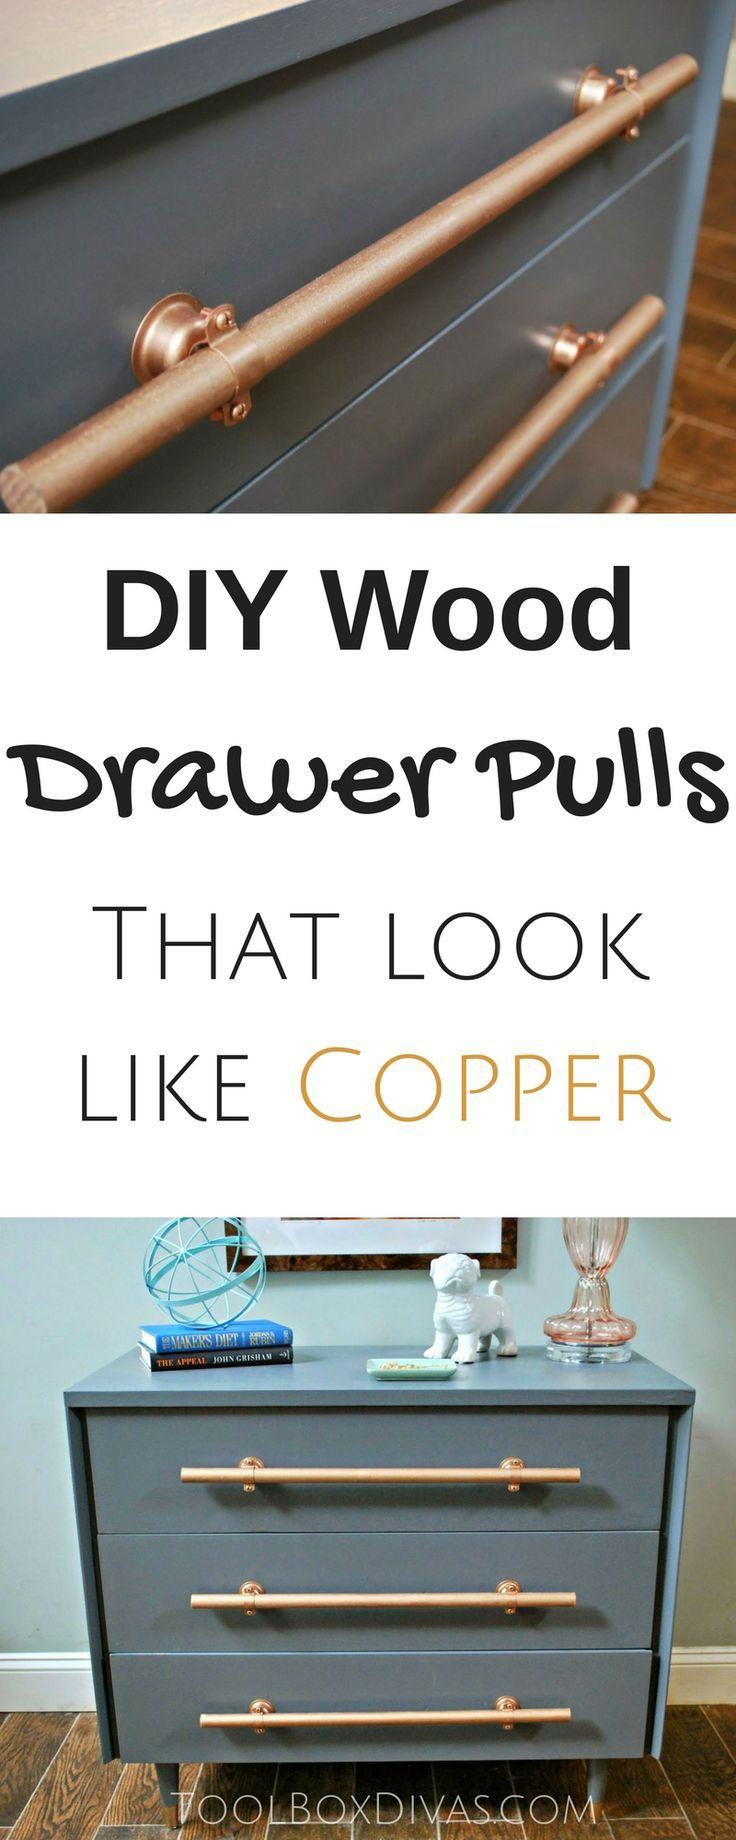 Furniture makeover. $19 thrift store find of a dresser. Handmade DIY wooden drawer pulls handles. #DIY #furniture #pulls #copper